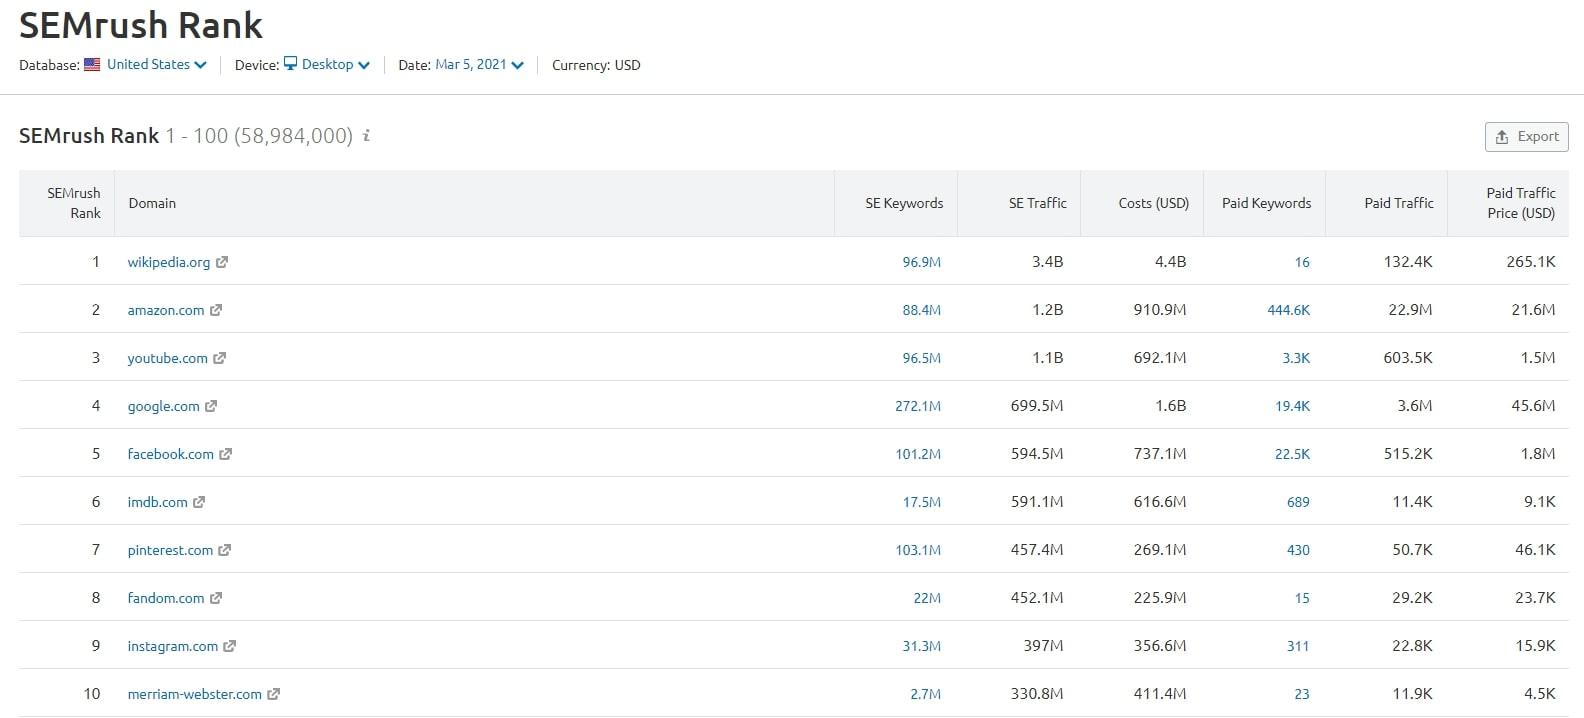 SEMrush Ranking list based on domain authority score